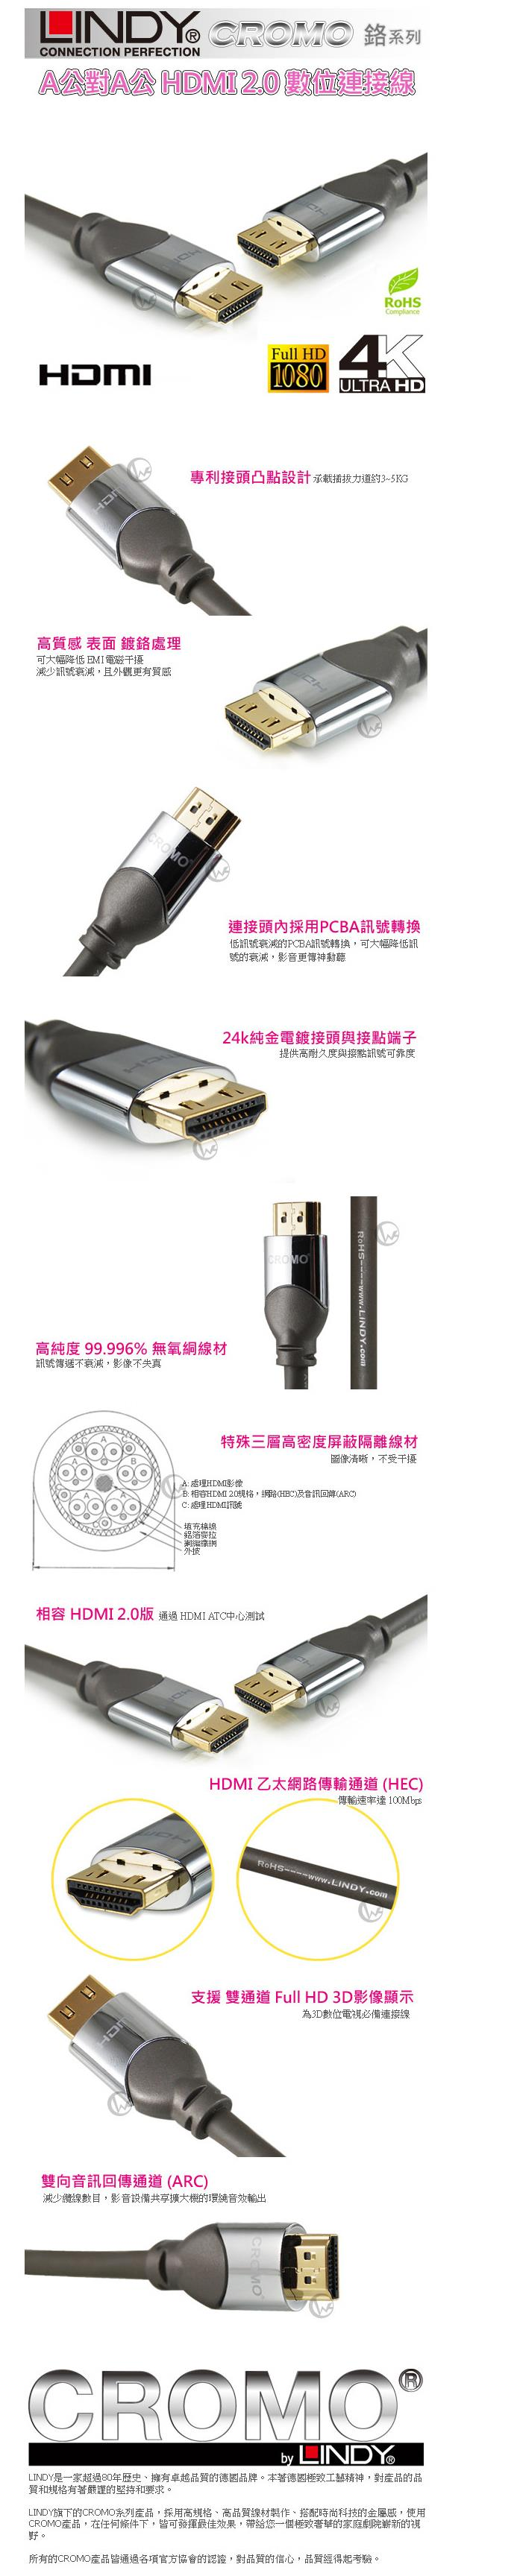 LINDY林帝 鉻系列 HDMI 2.0連接線 10M 41446價格比價資訊 |friDay購物